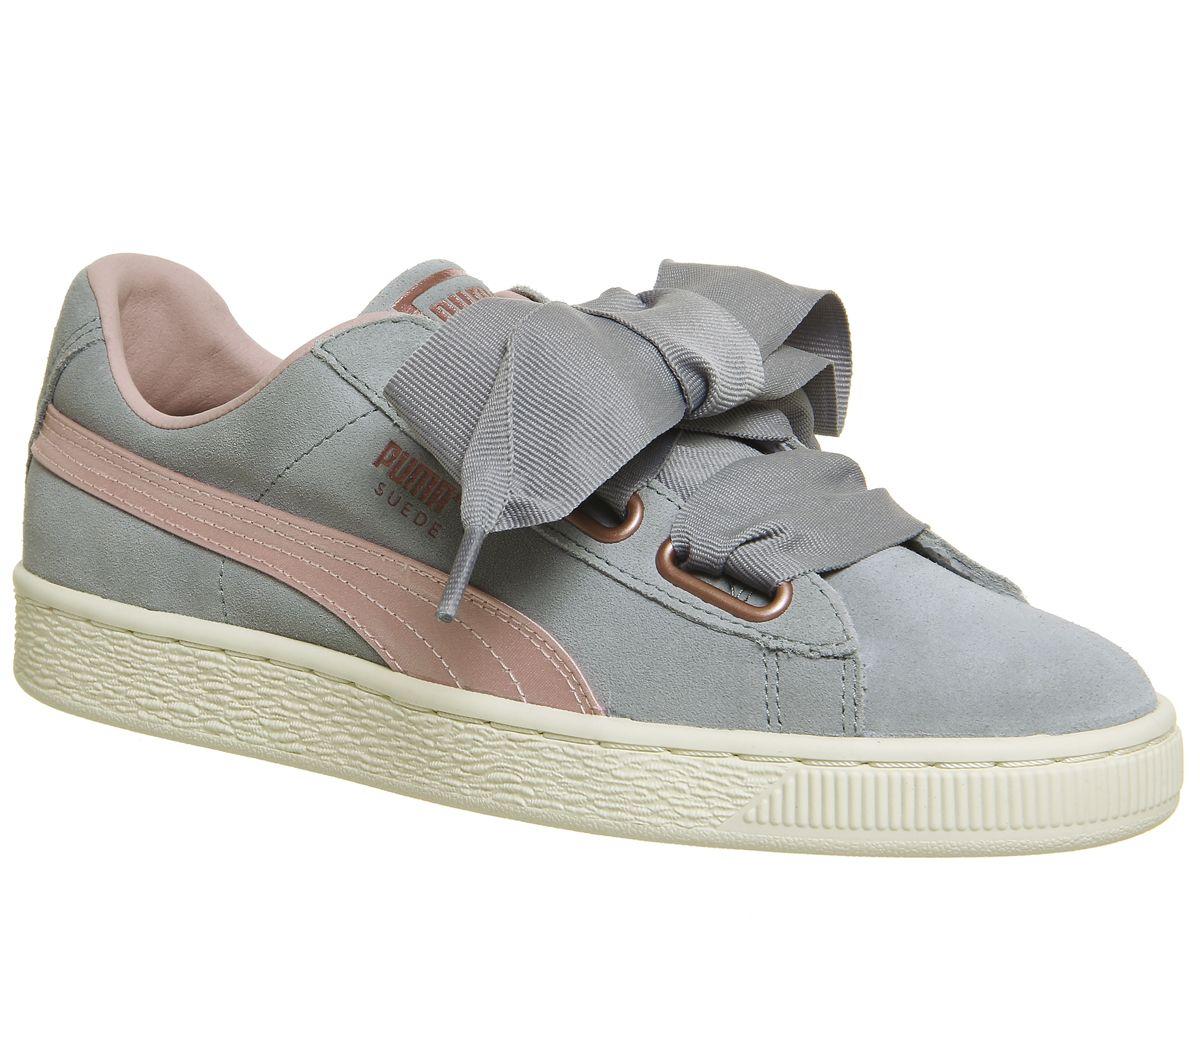 Puma Suede Heart Satin II Wn s Sneakers For Women Buy